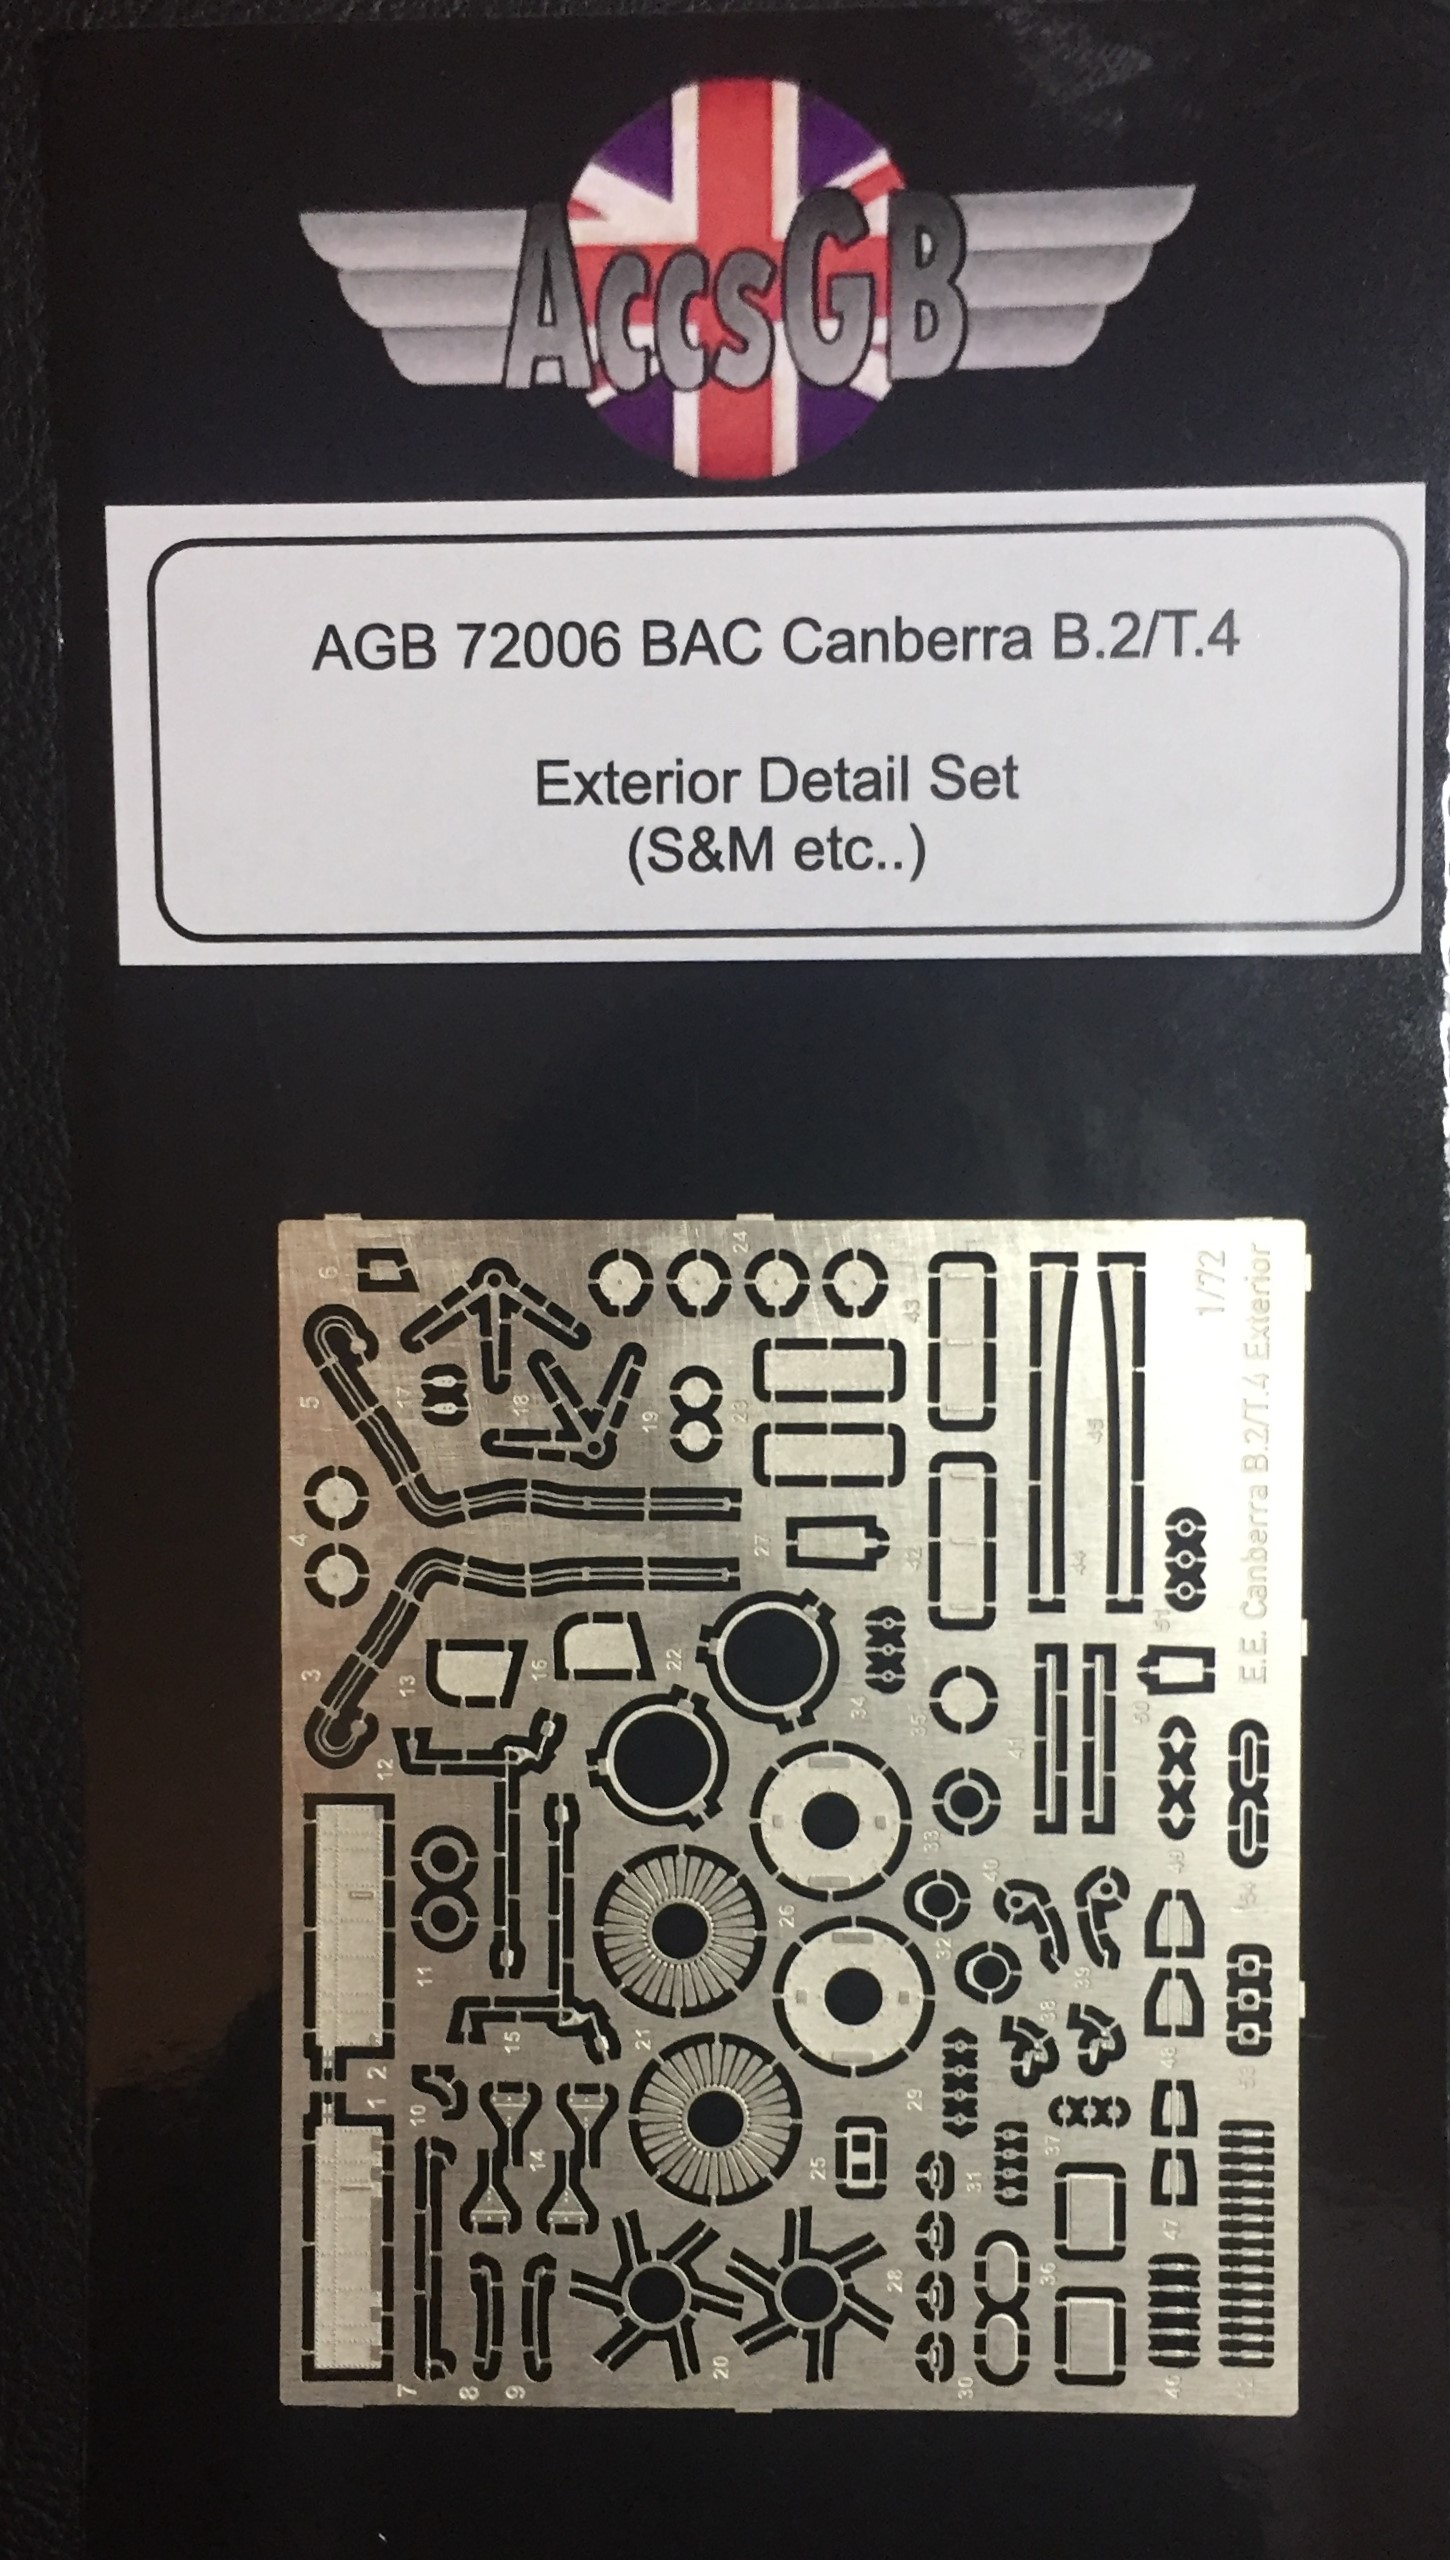 AGB72006